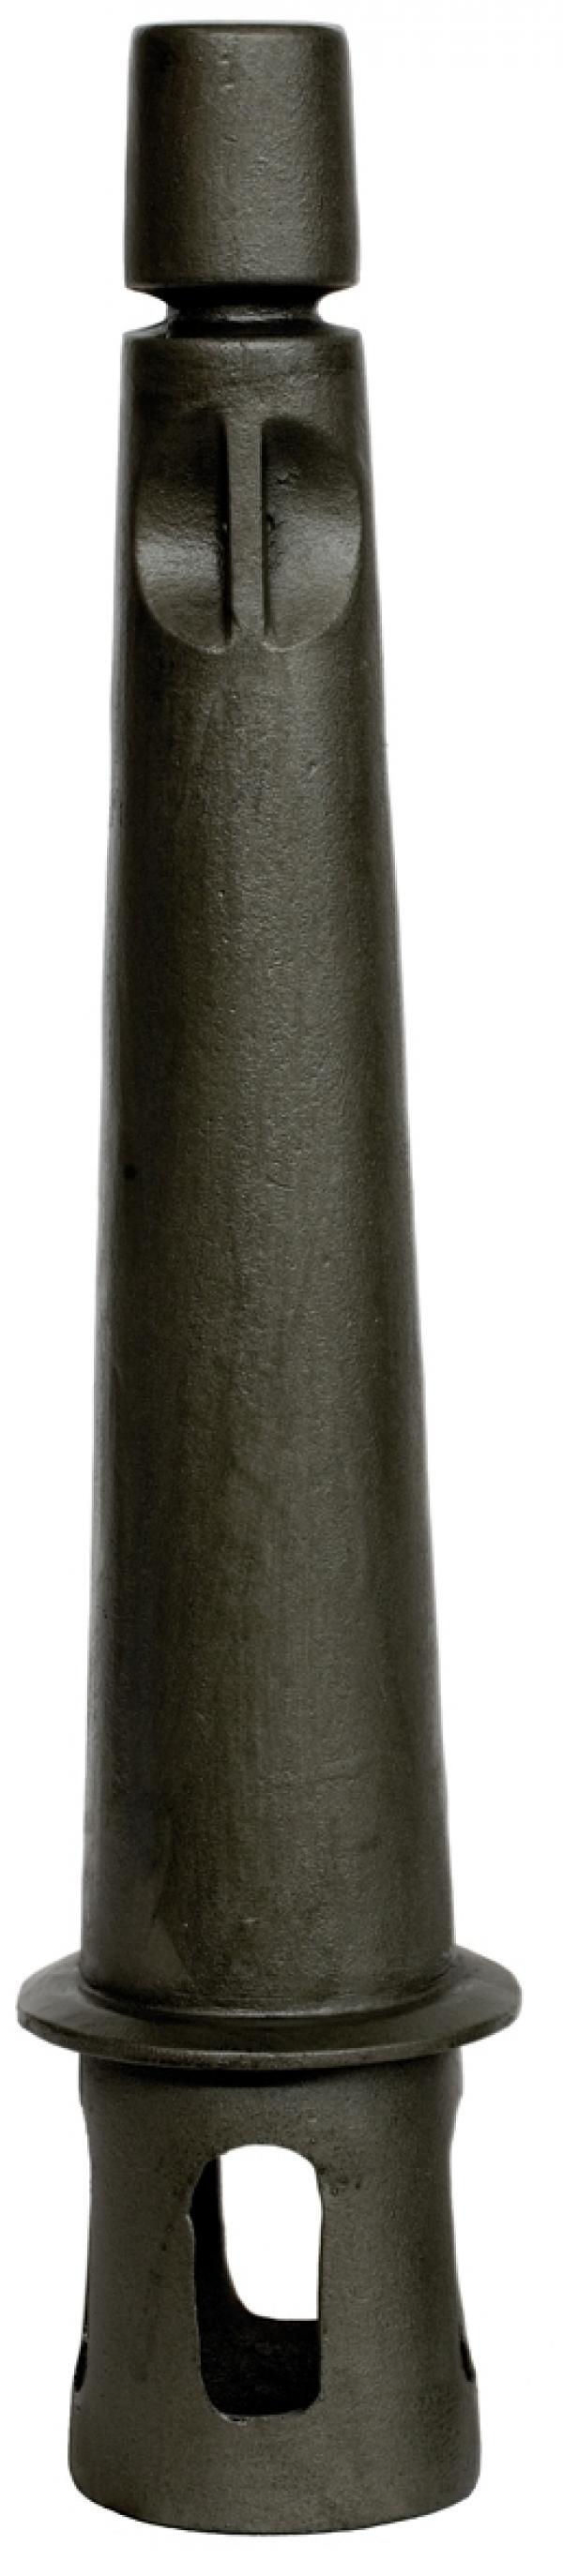 Imagen de Canaria pilona